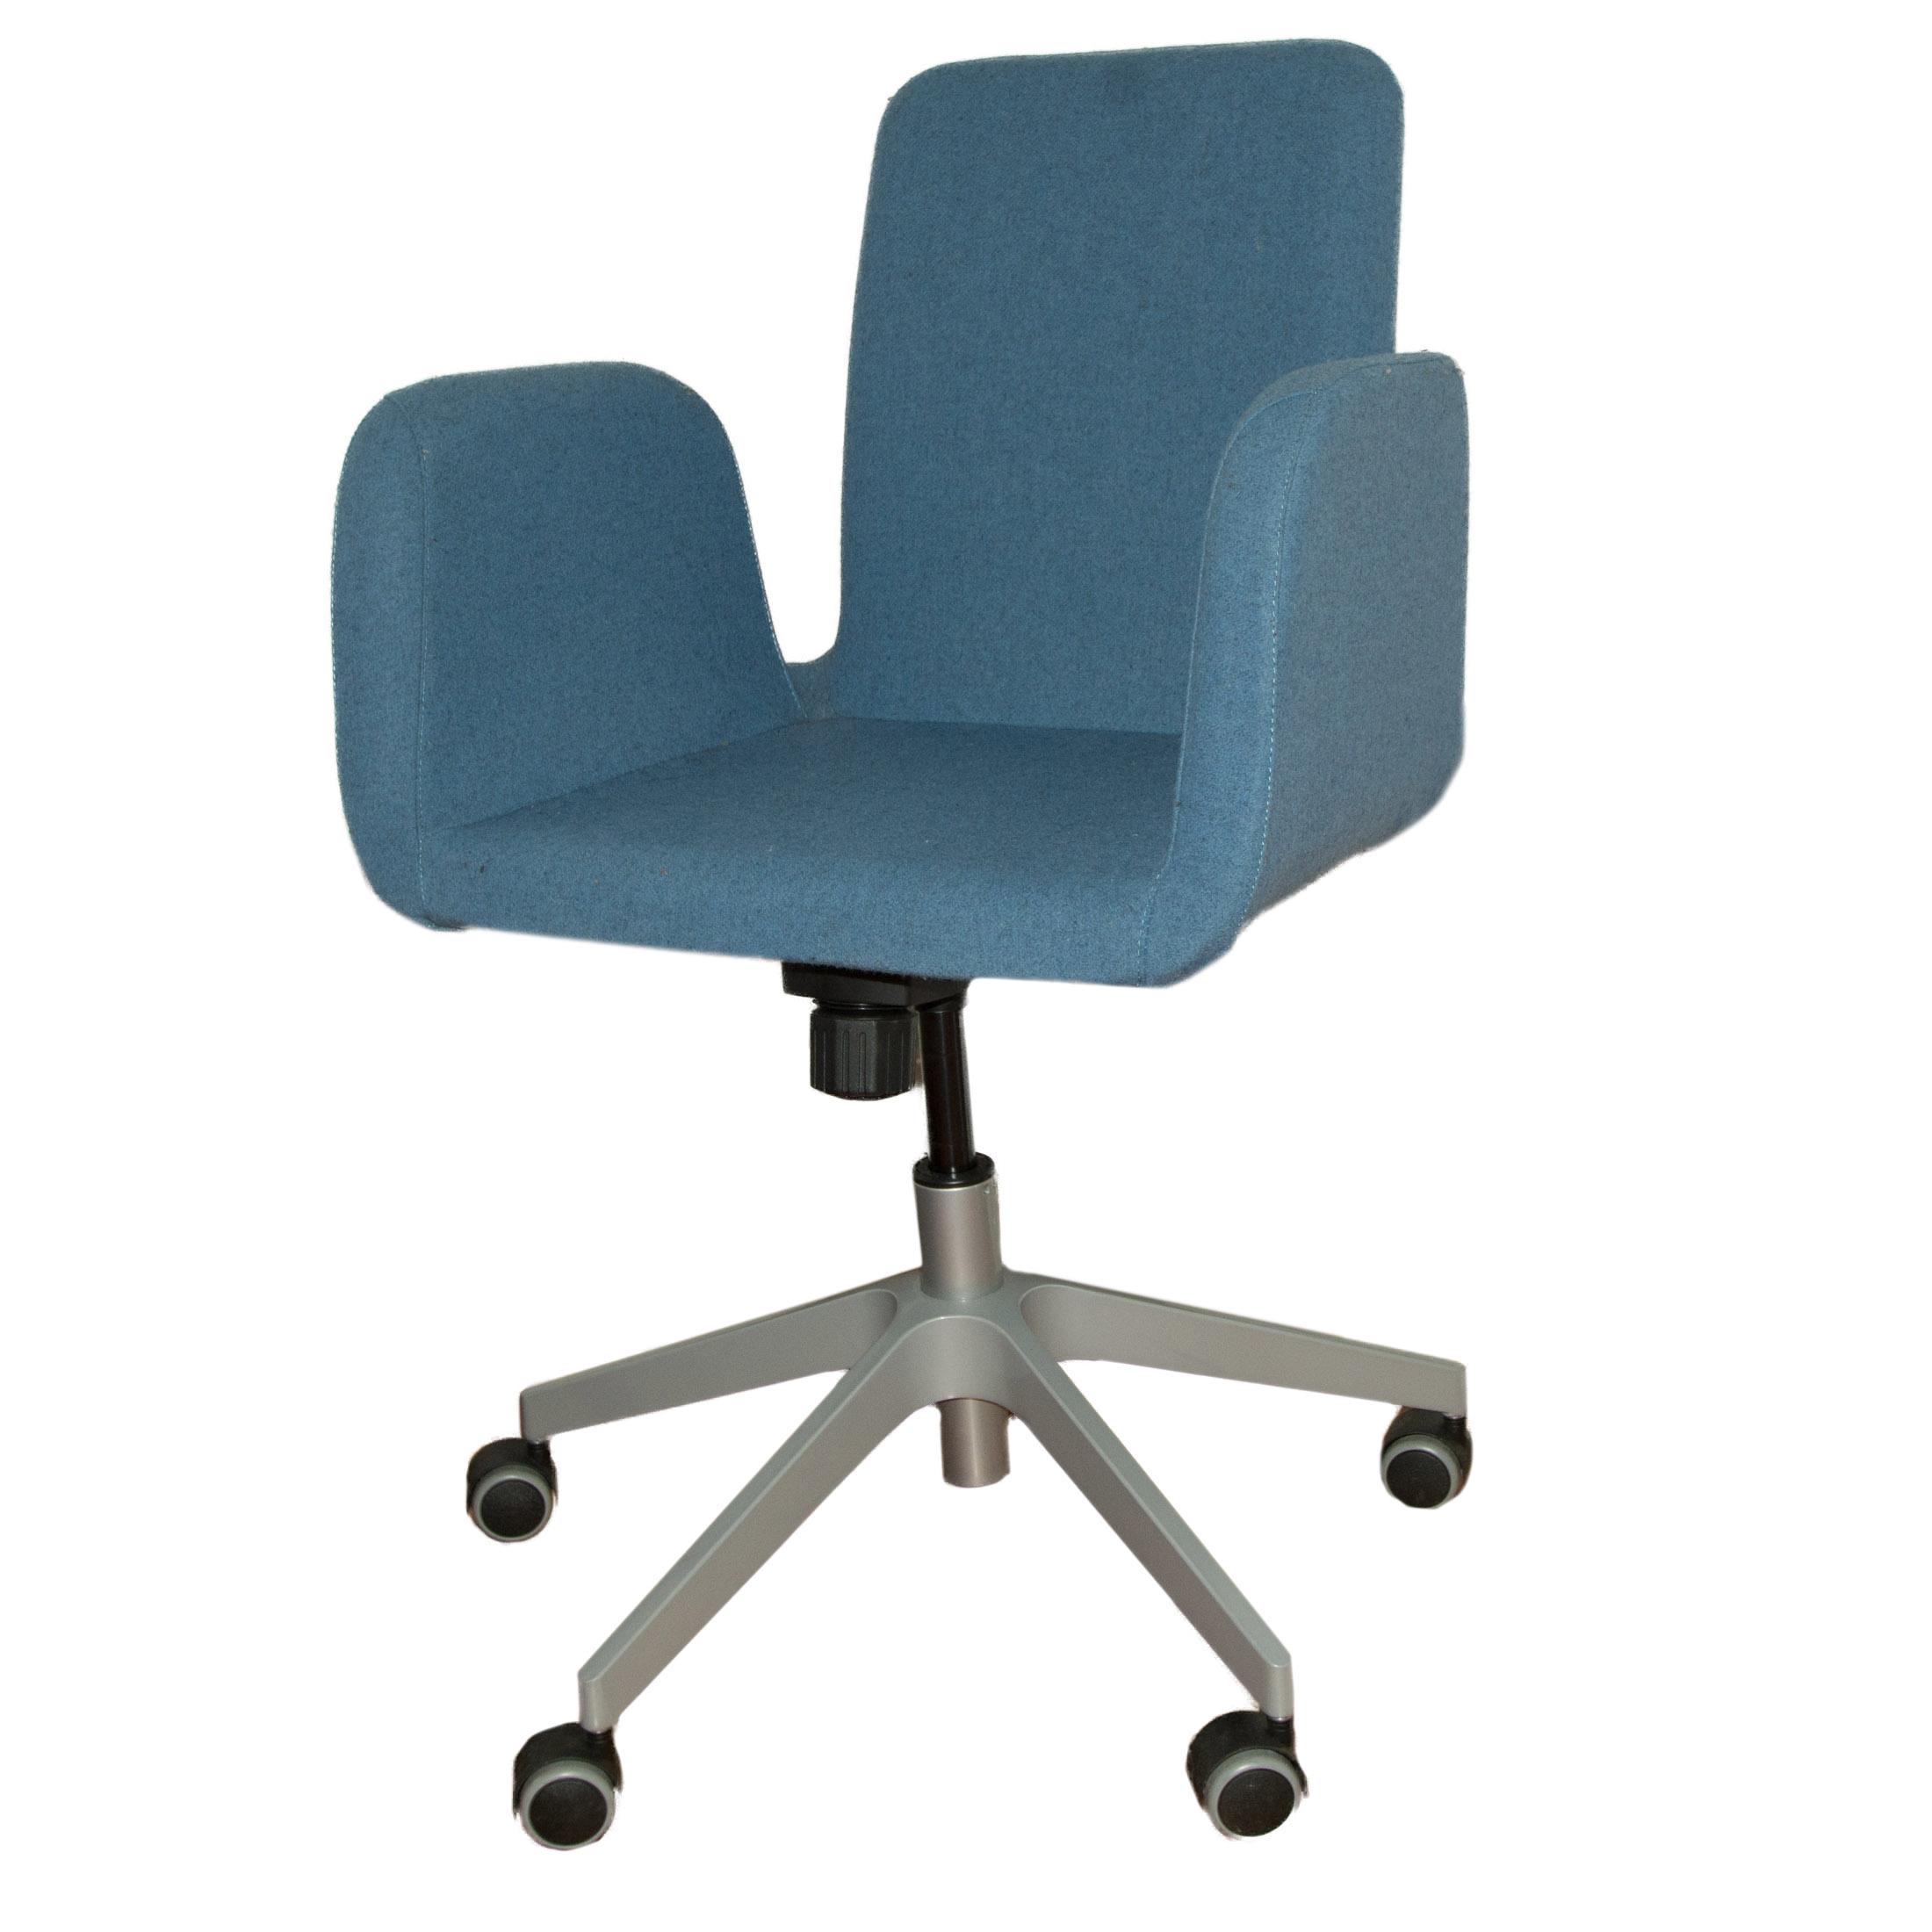 ikea metal chairs purple high chair patrik desk ebth